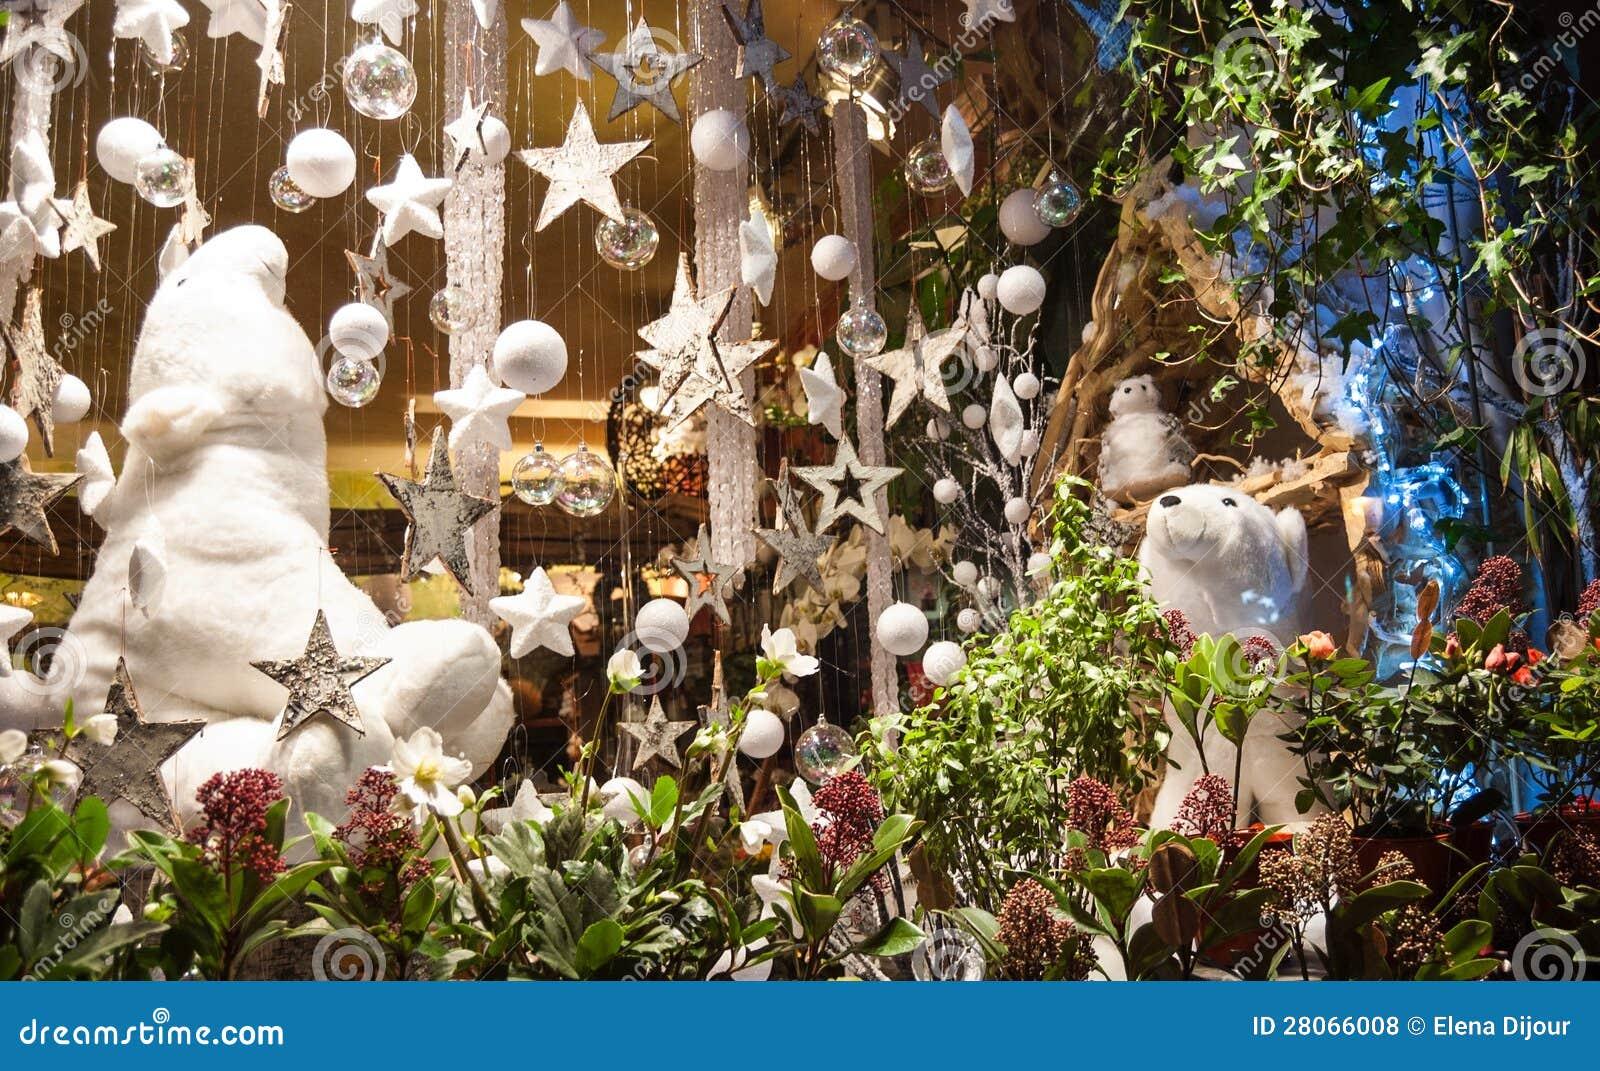 http://thumbs.dreamstime.com/z/christmas-decoration-flower-shop-28066008.jpg